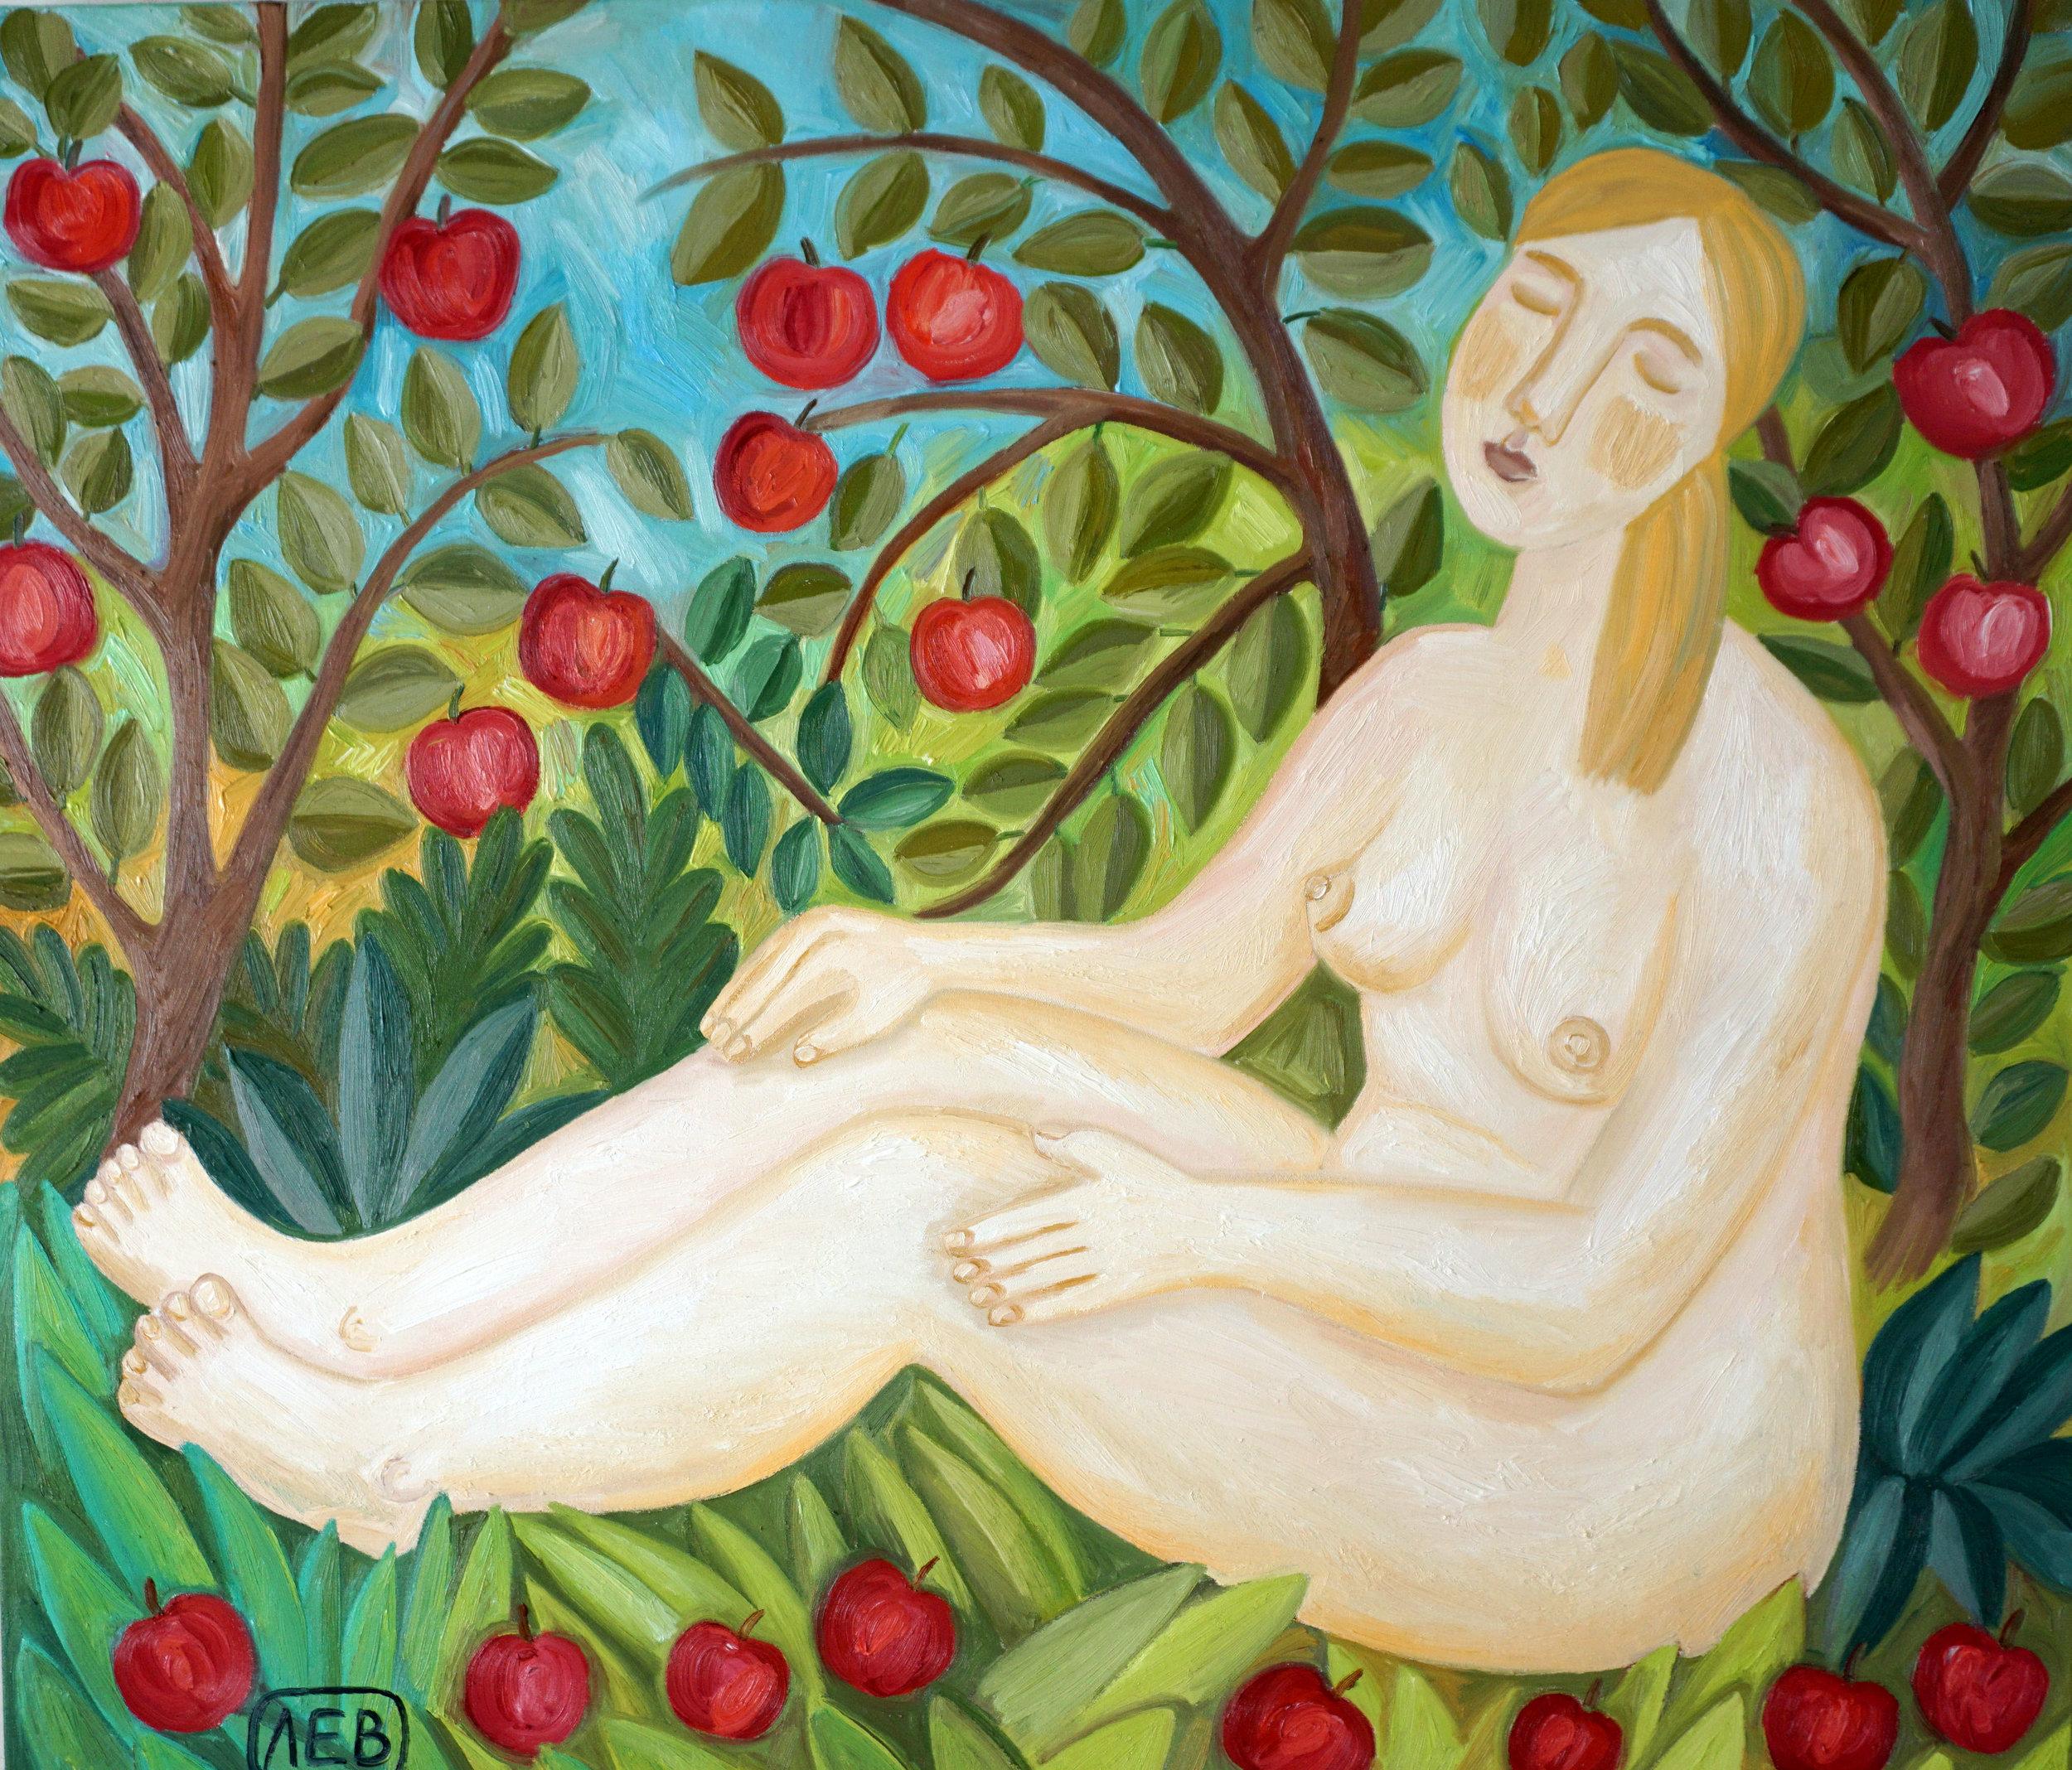 """The Savior of the Apple Feast Day""111х96 sм, 2016 oil on canvas"